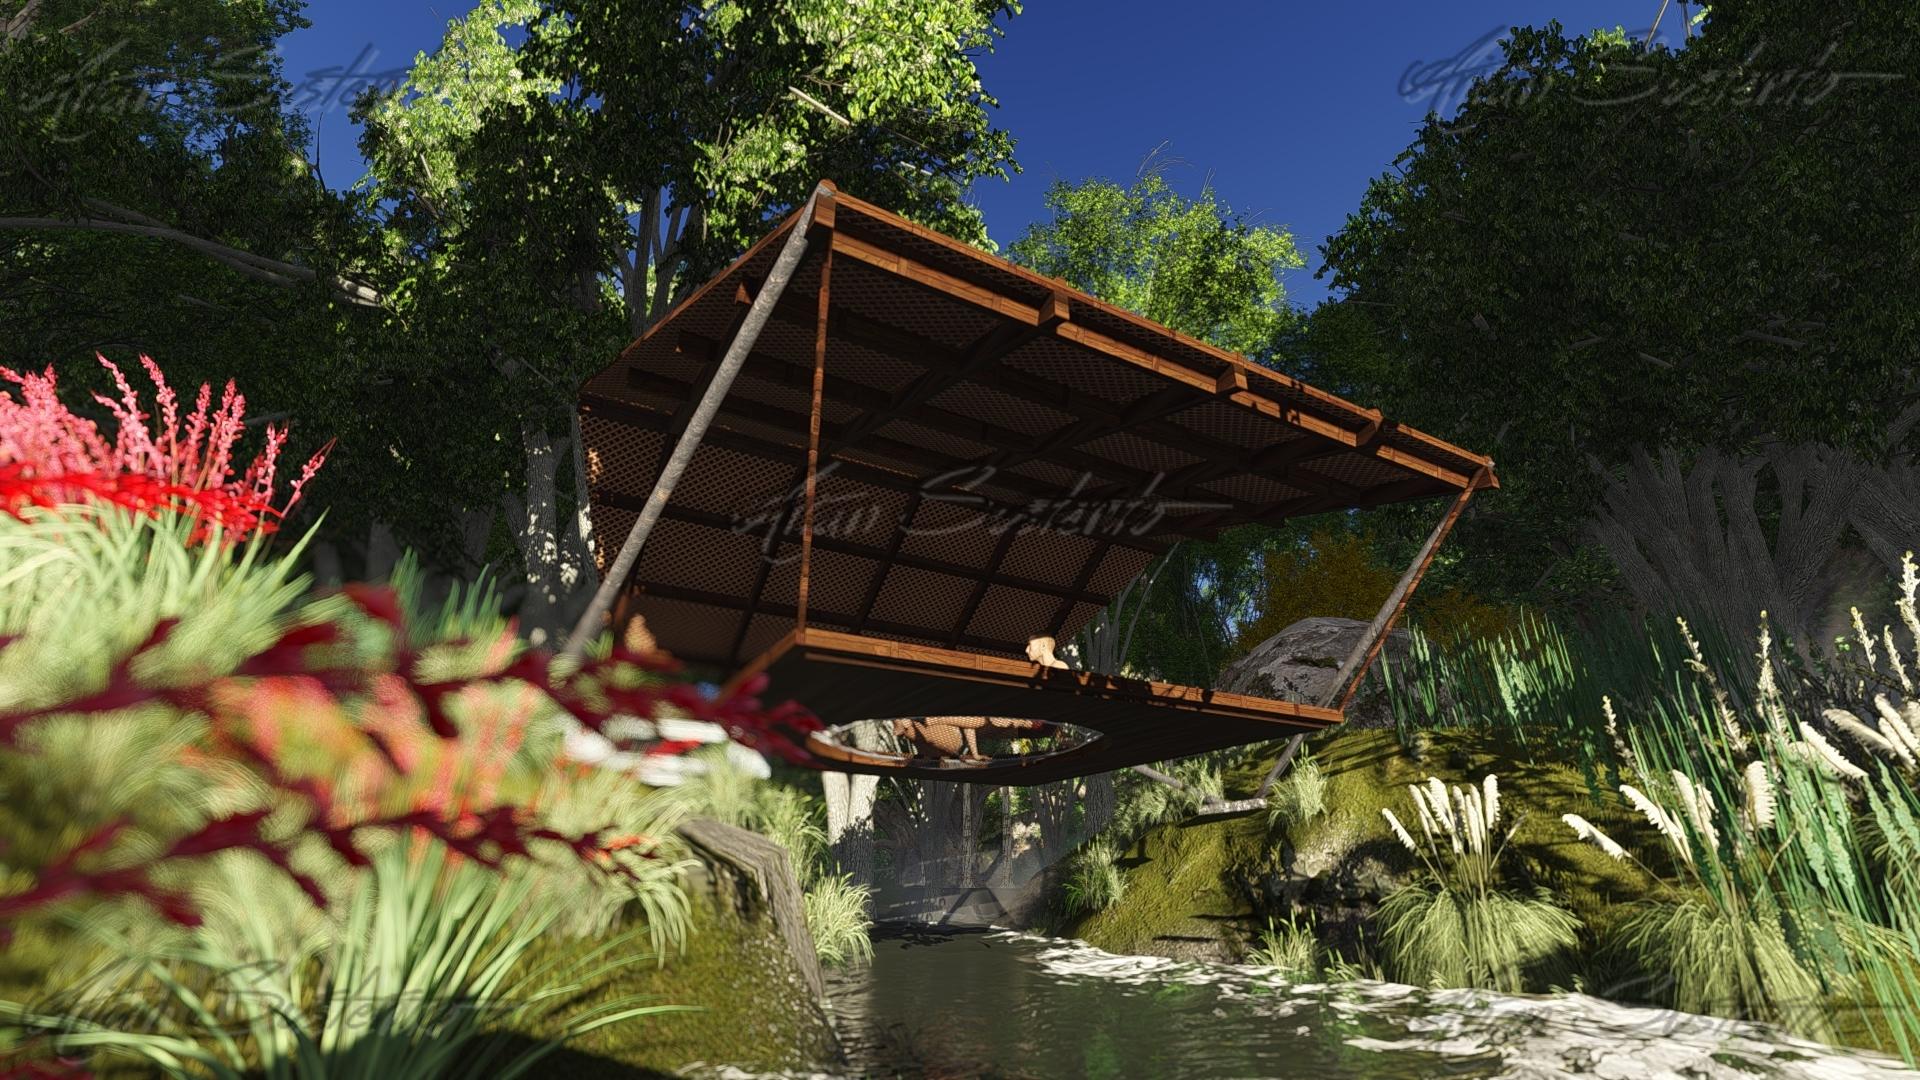 Hammock Cabana by thearianway